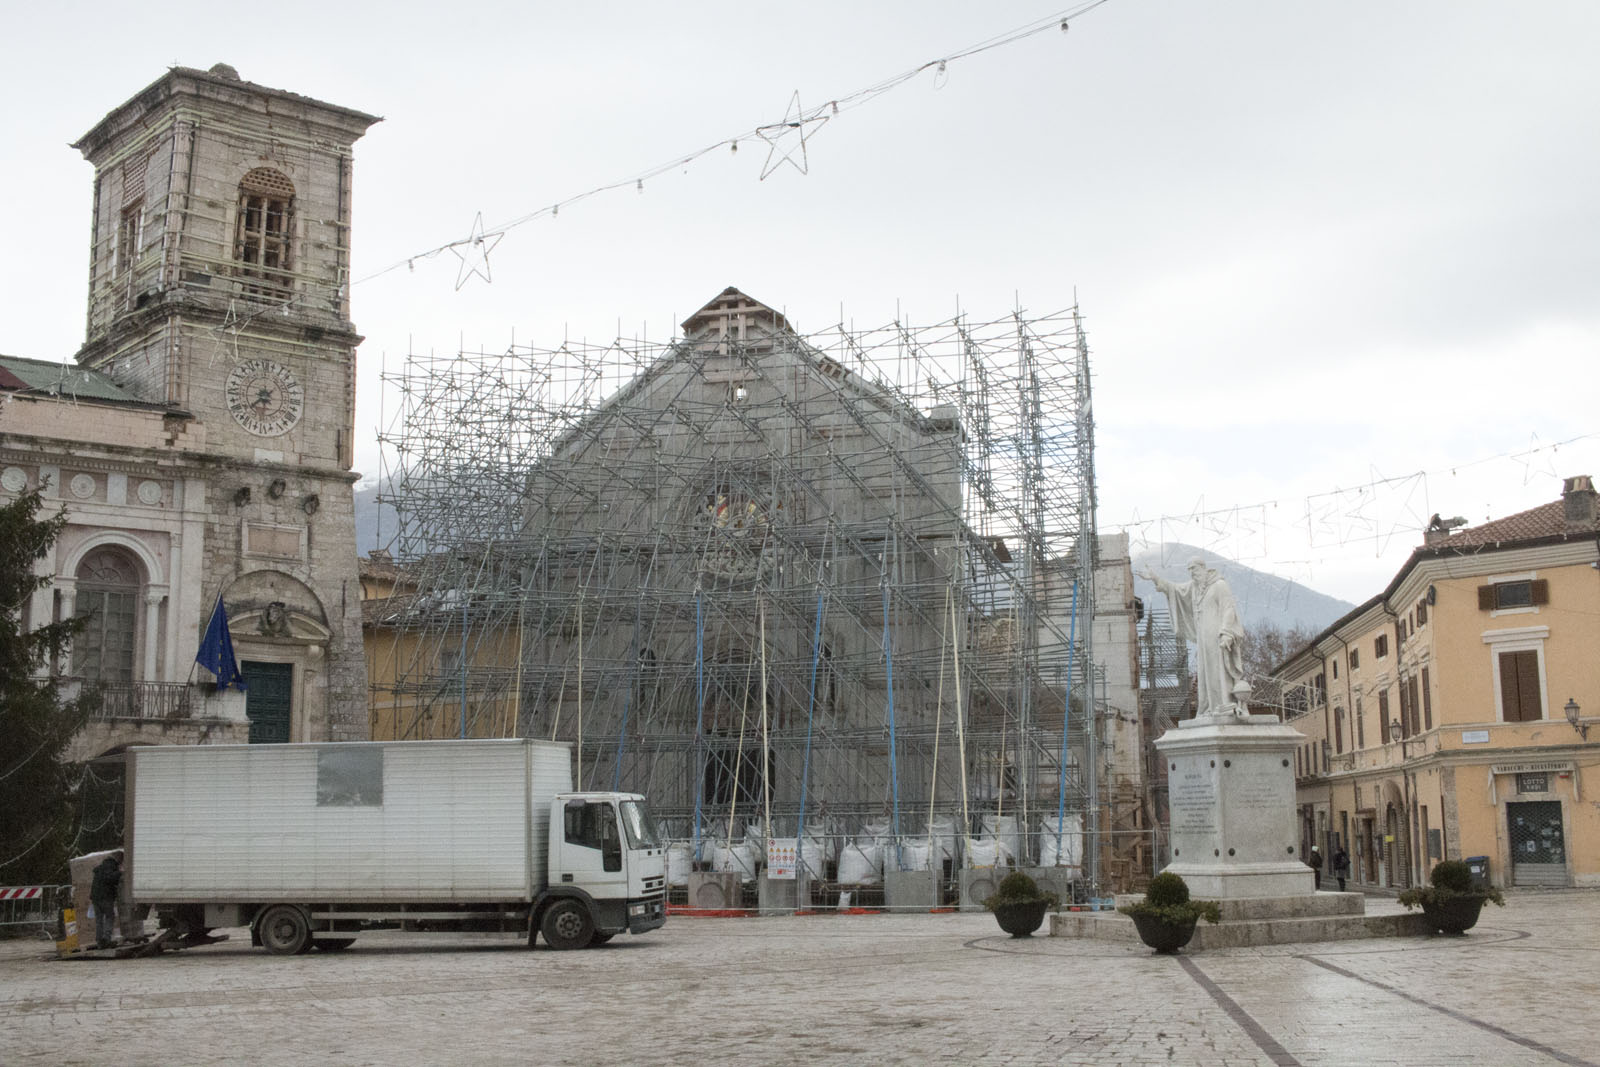 Basilica of St Benedict of Nursia Scaffolding